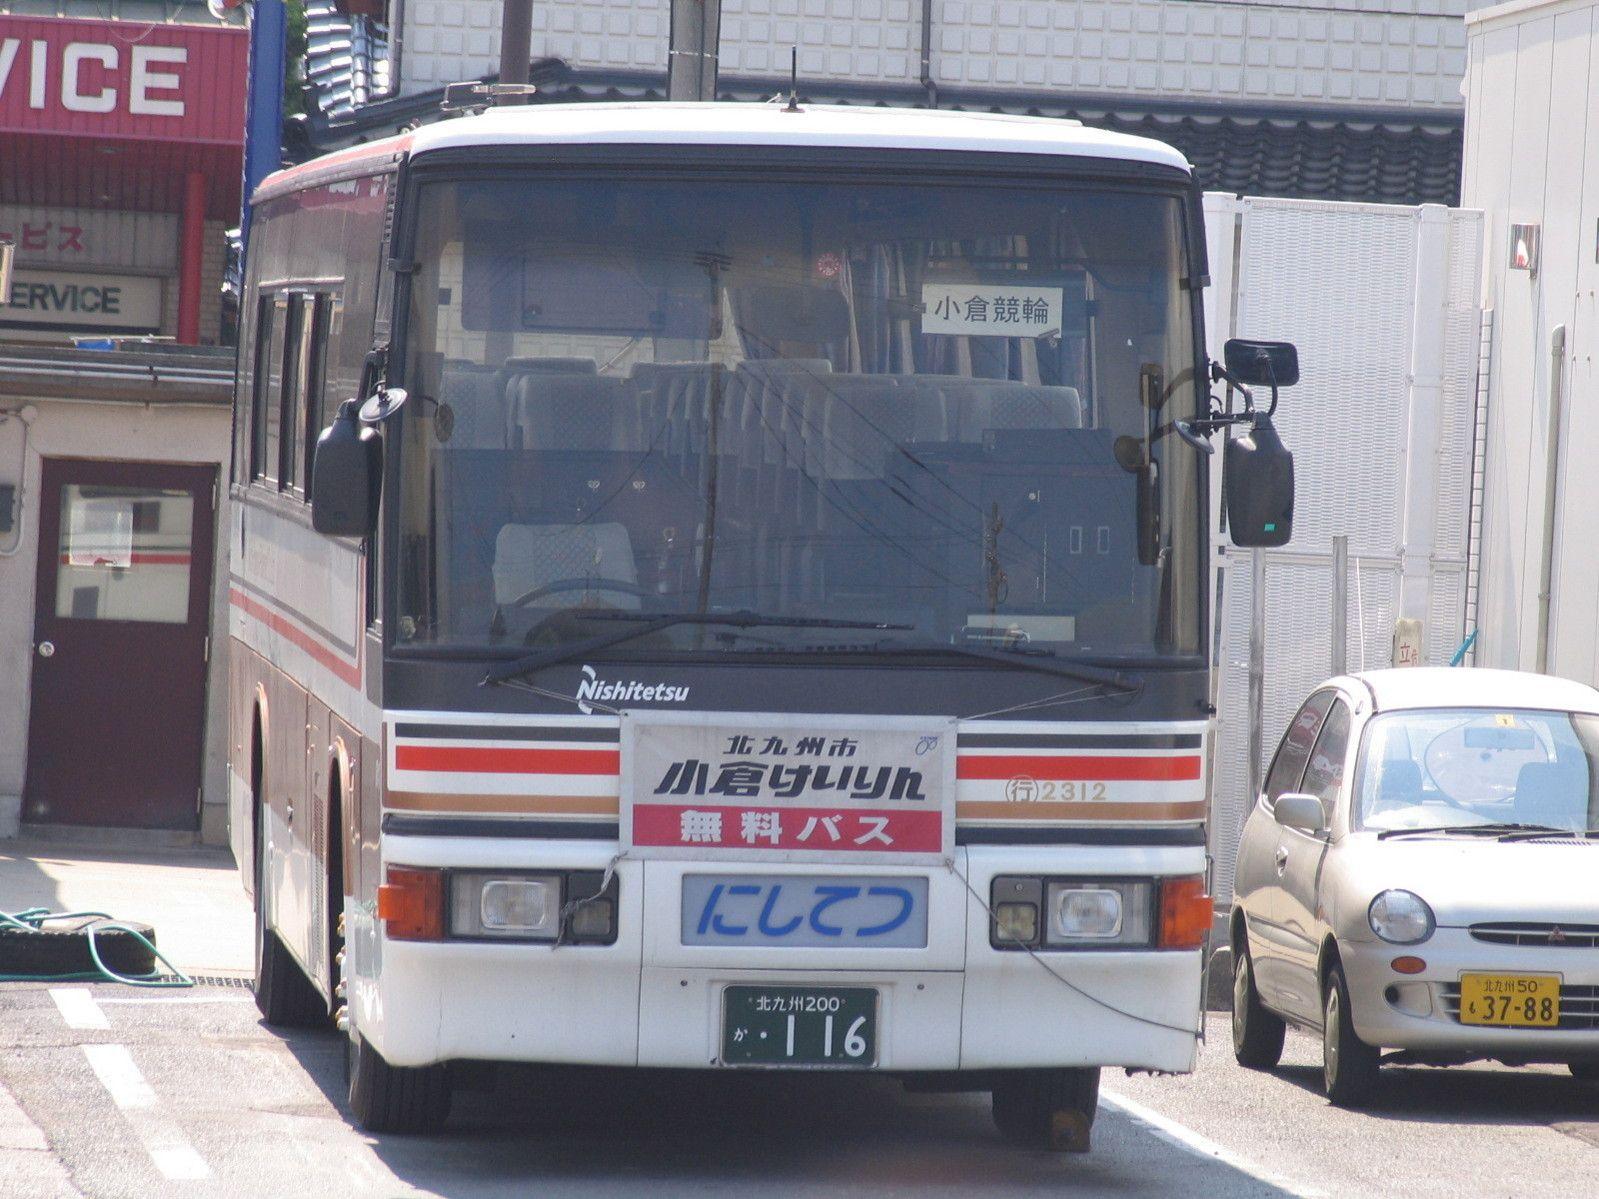 小倉競輪 バス